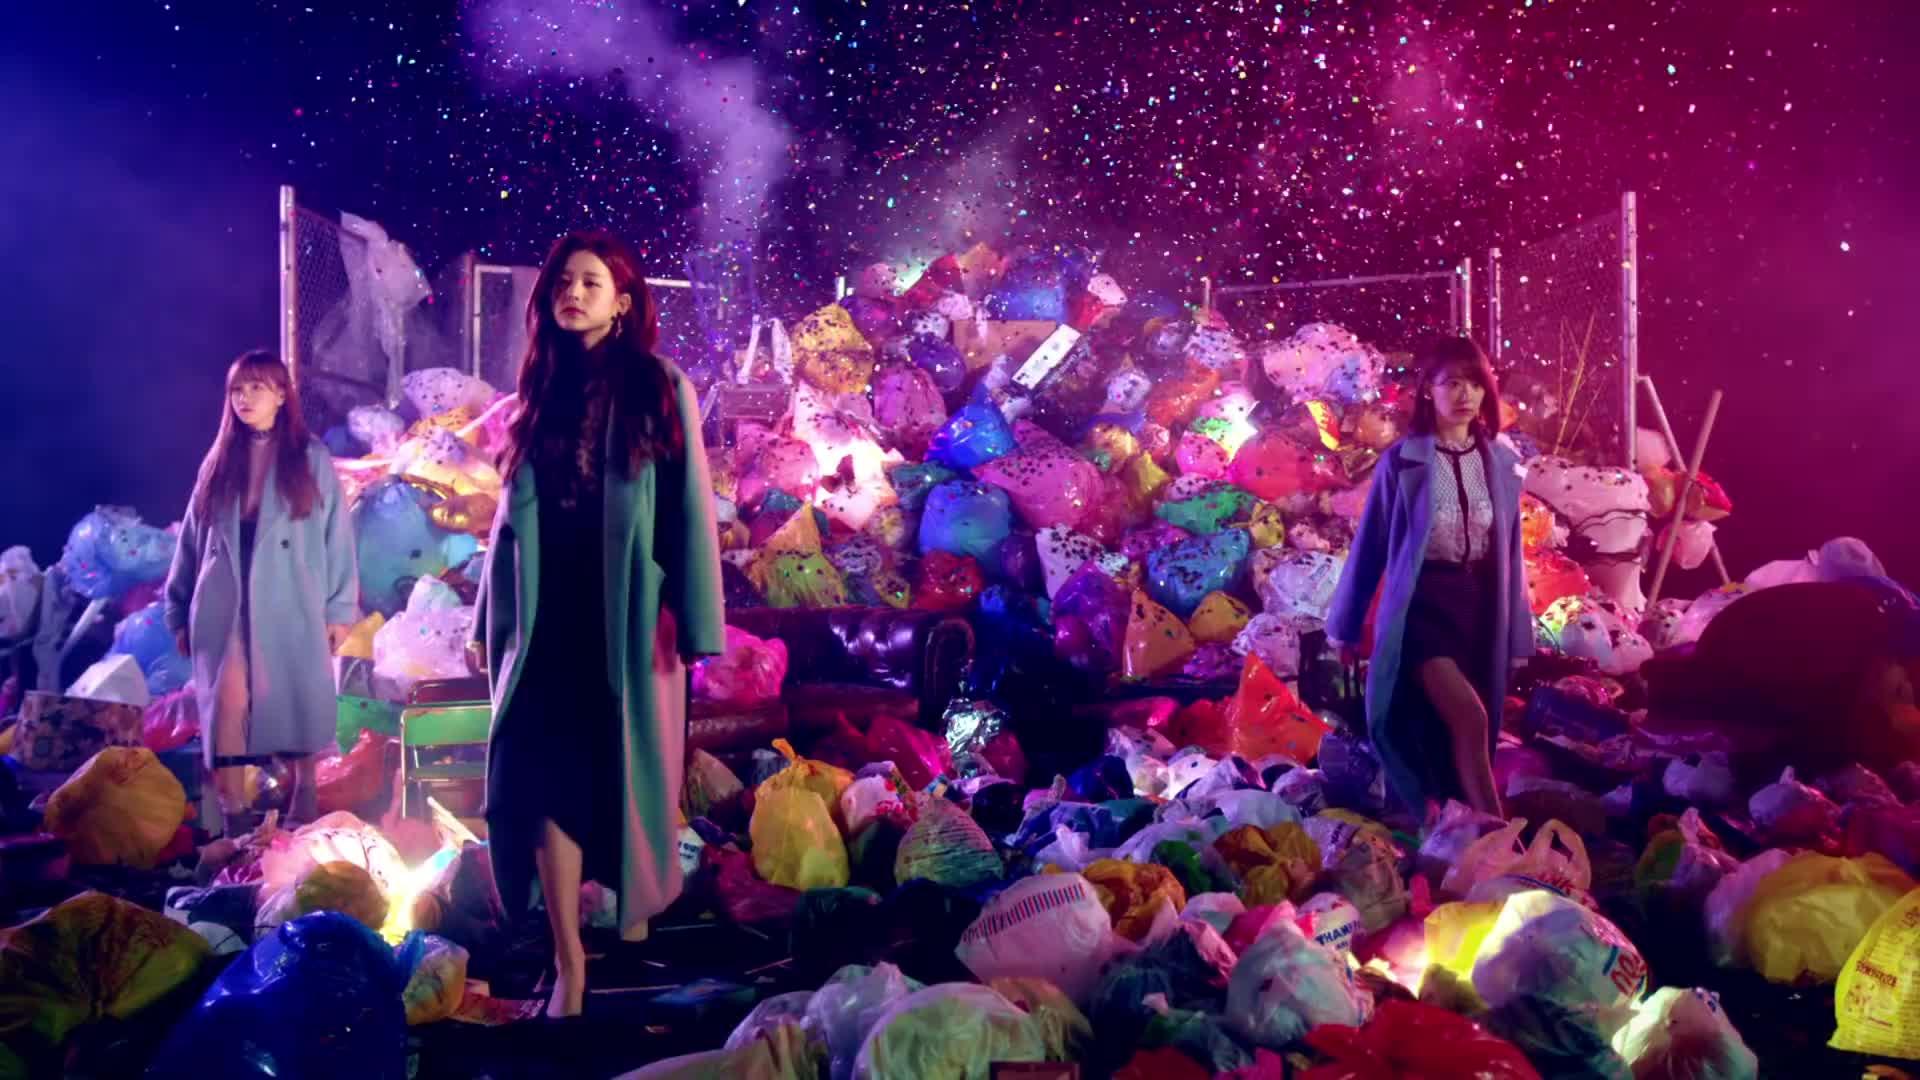 sakura, wonyoung, yuri, izone walking from trash GIFs